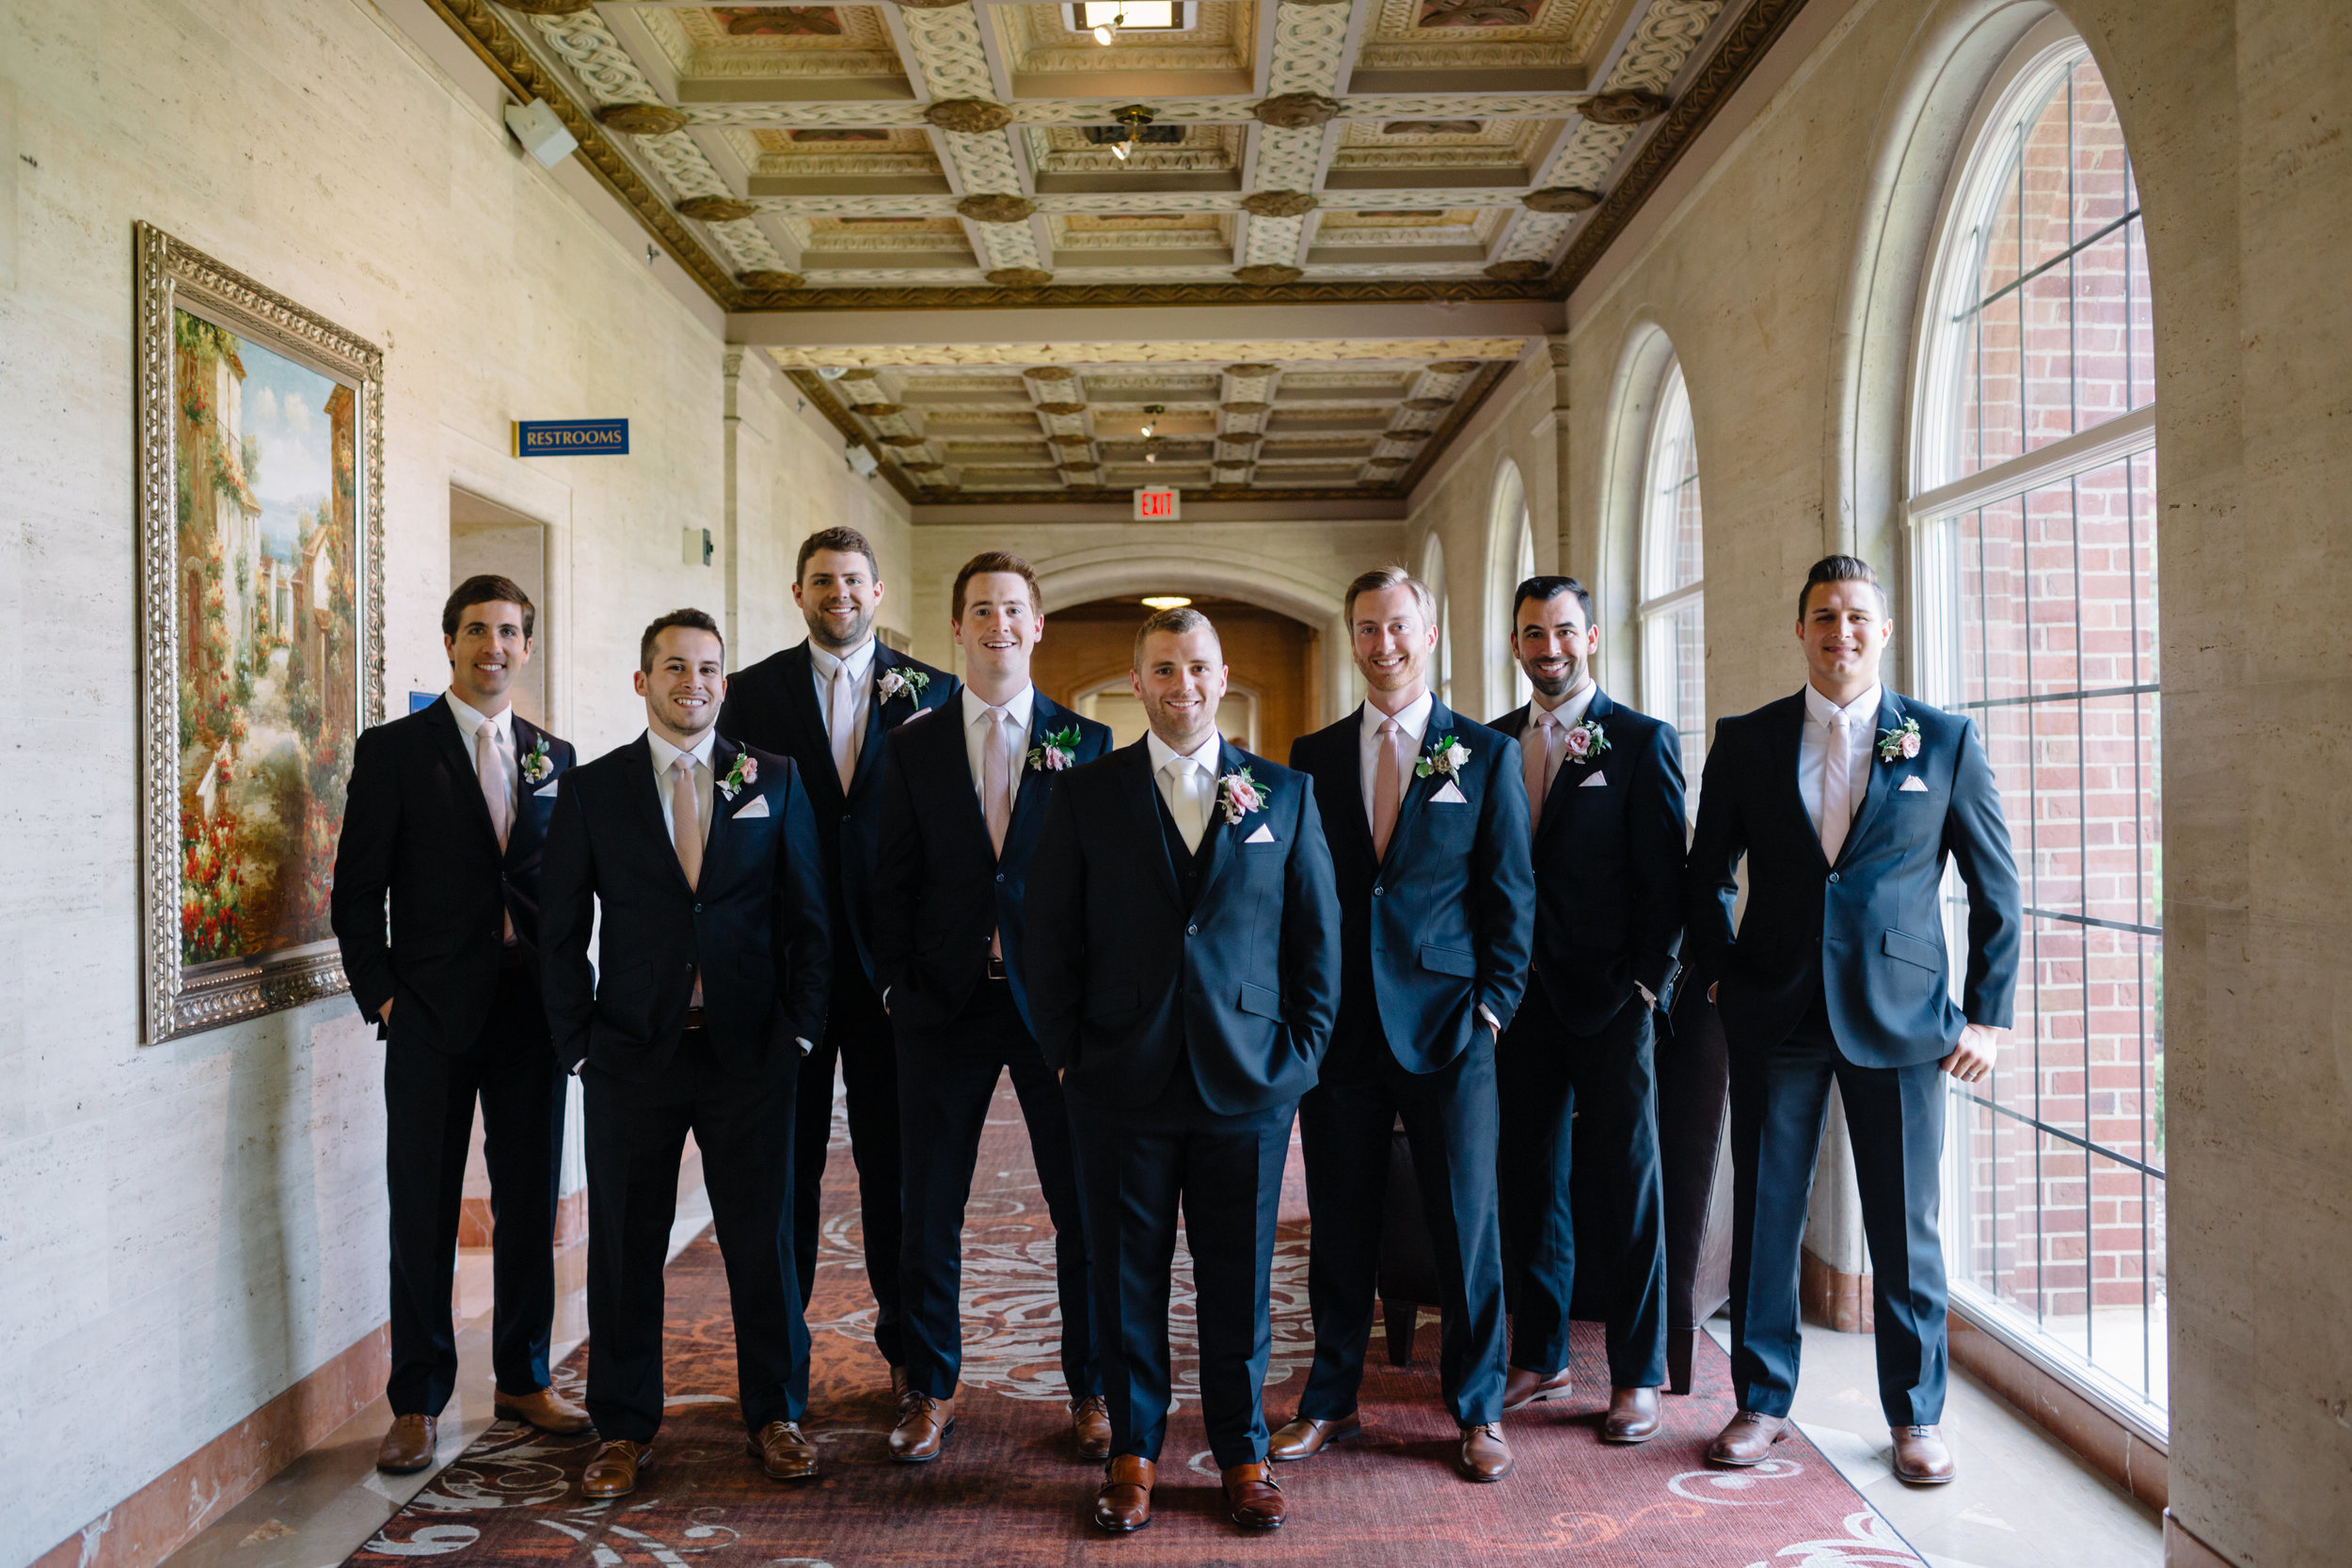 custom wedding planners michigan event design paper goods florals bridal party groomsmen